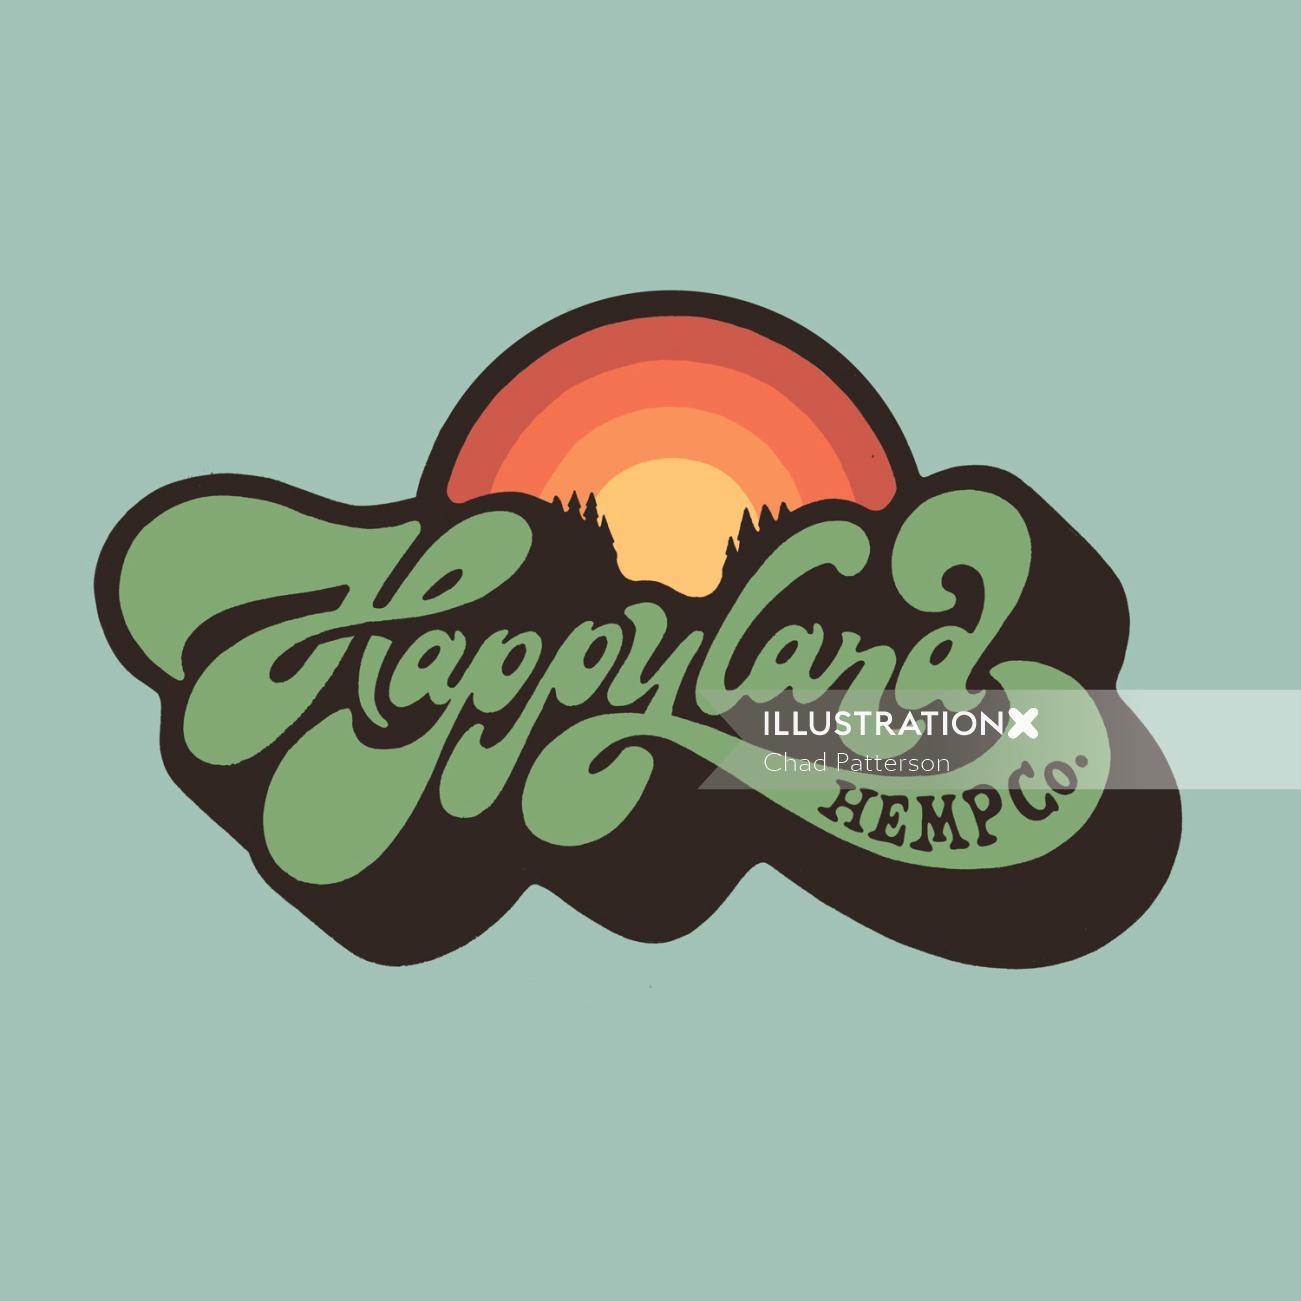 Brand hand lettering logo Wordmark for Happy land Hemp co